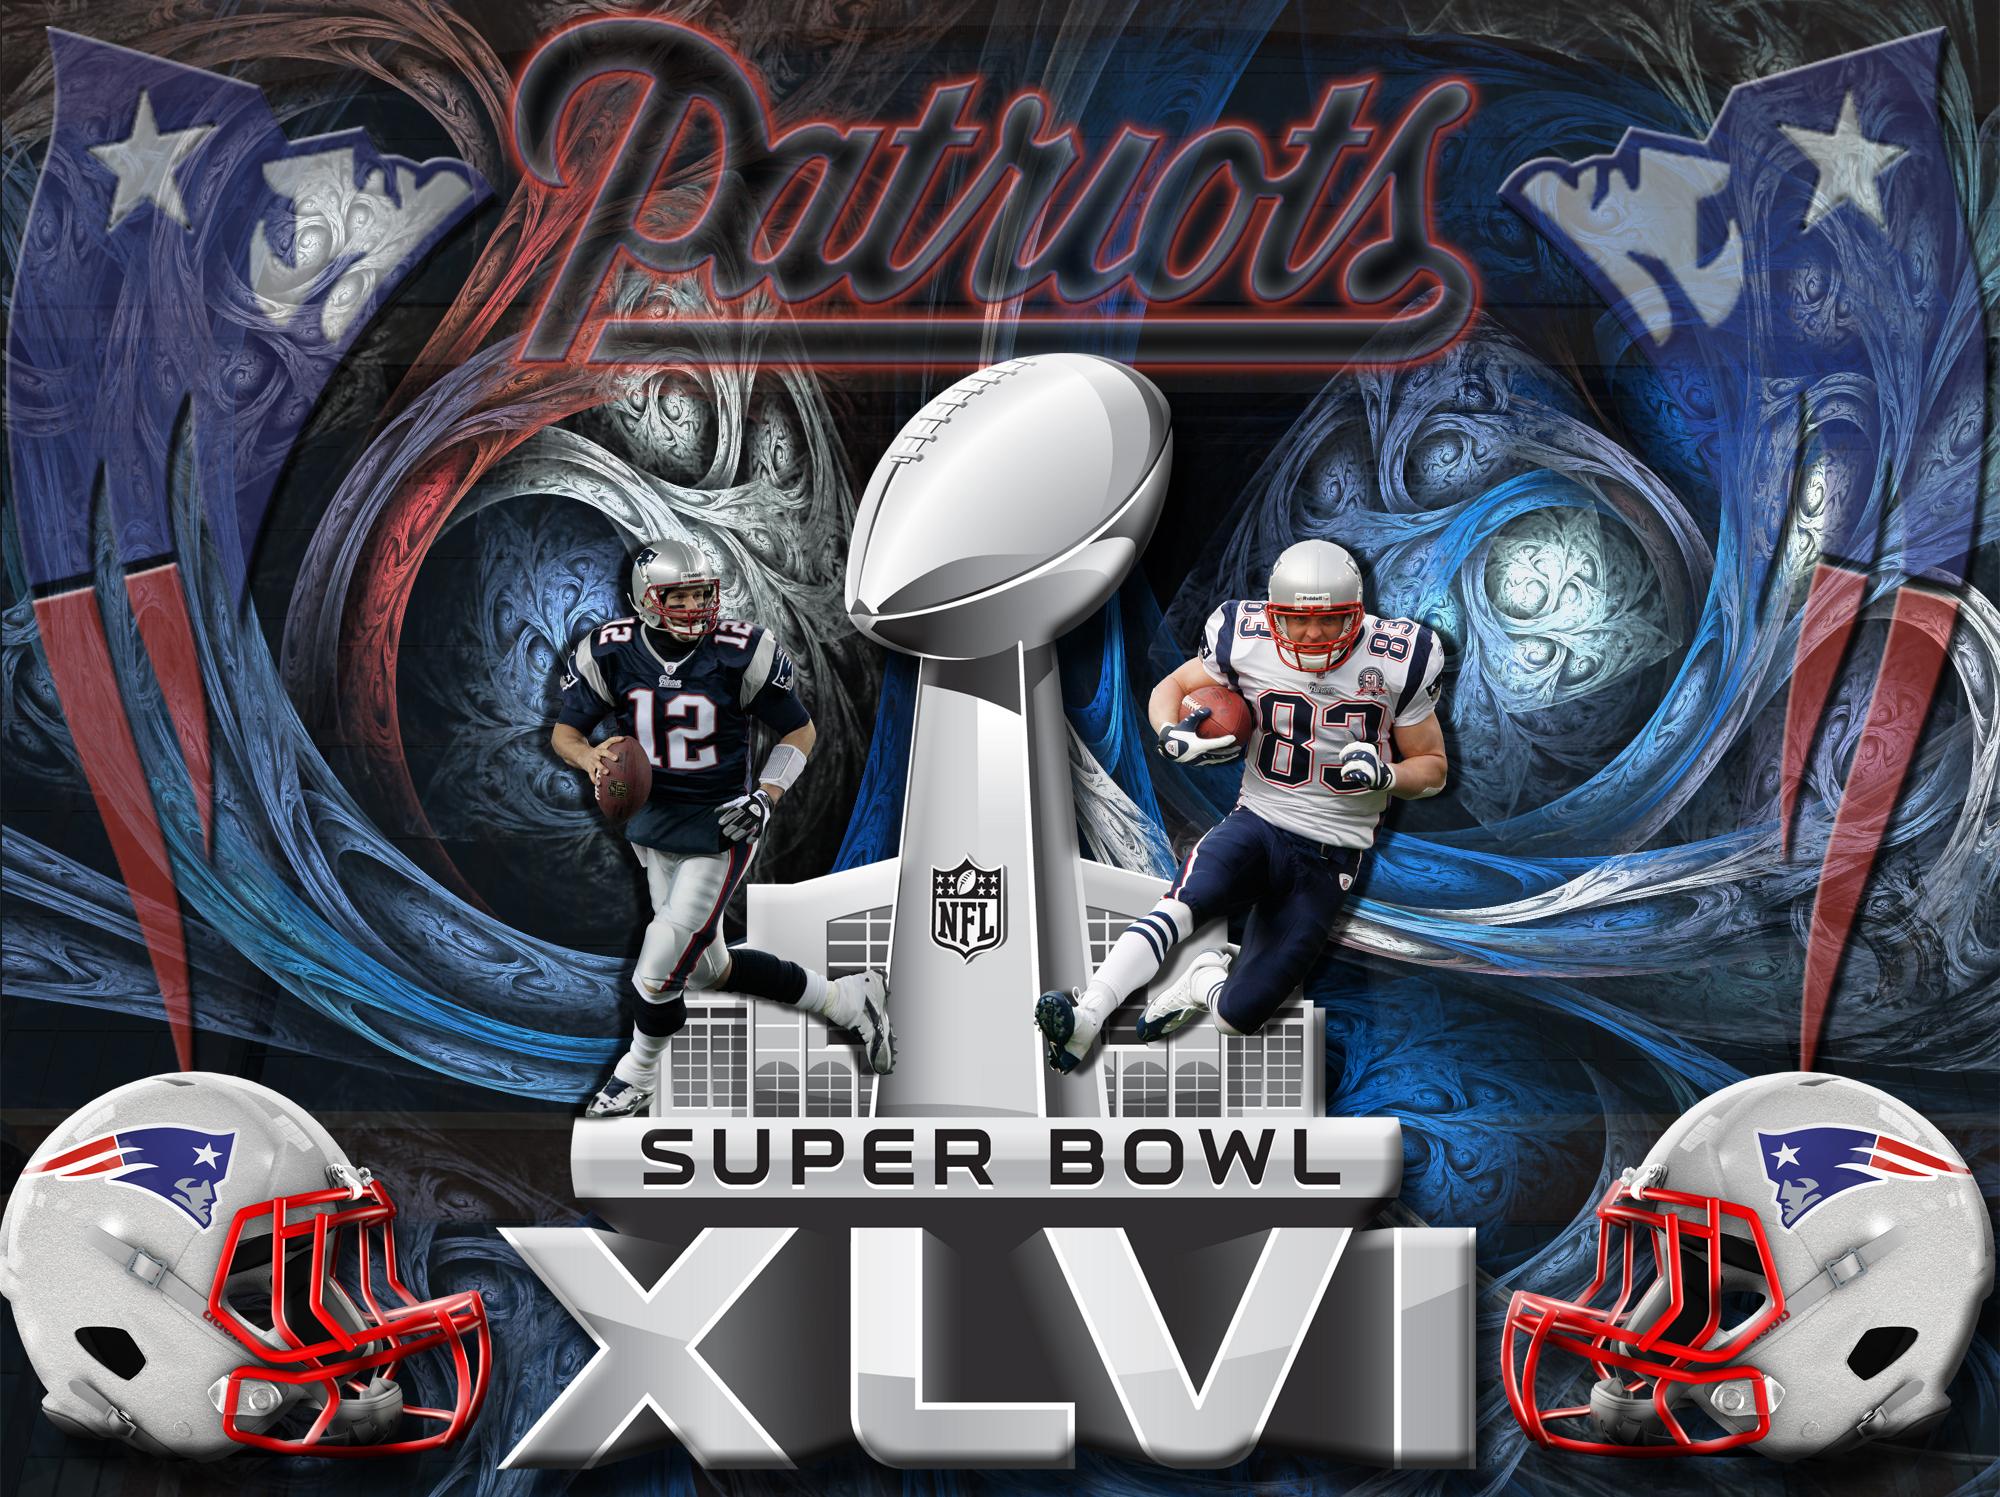 New England Patriots Screensaver Wallpaper - New England Patriots Super Bowl Background - HD Wallpaper